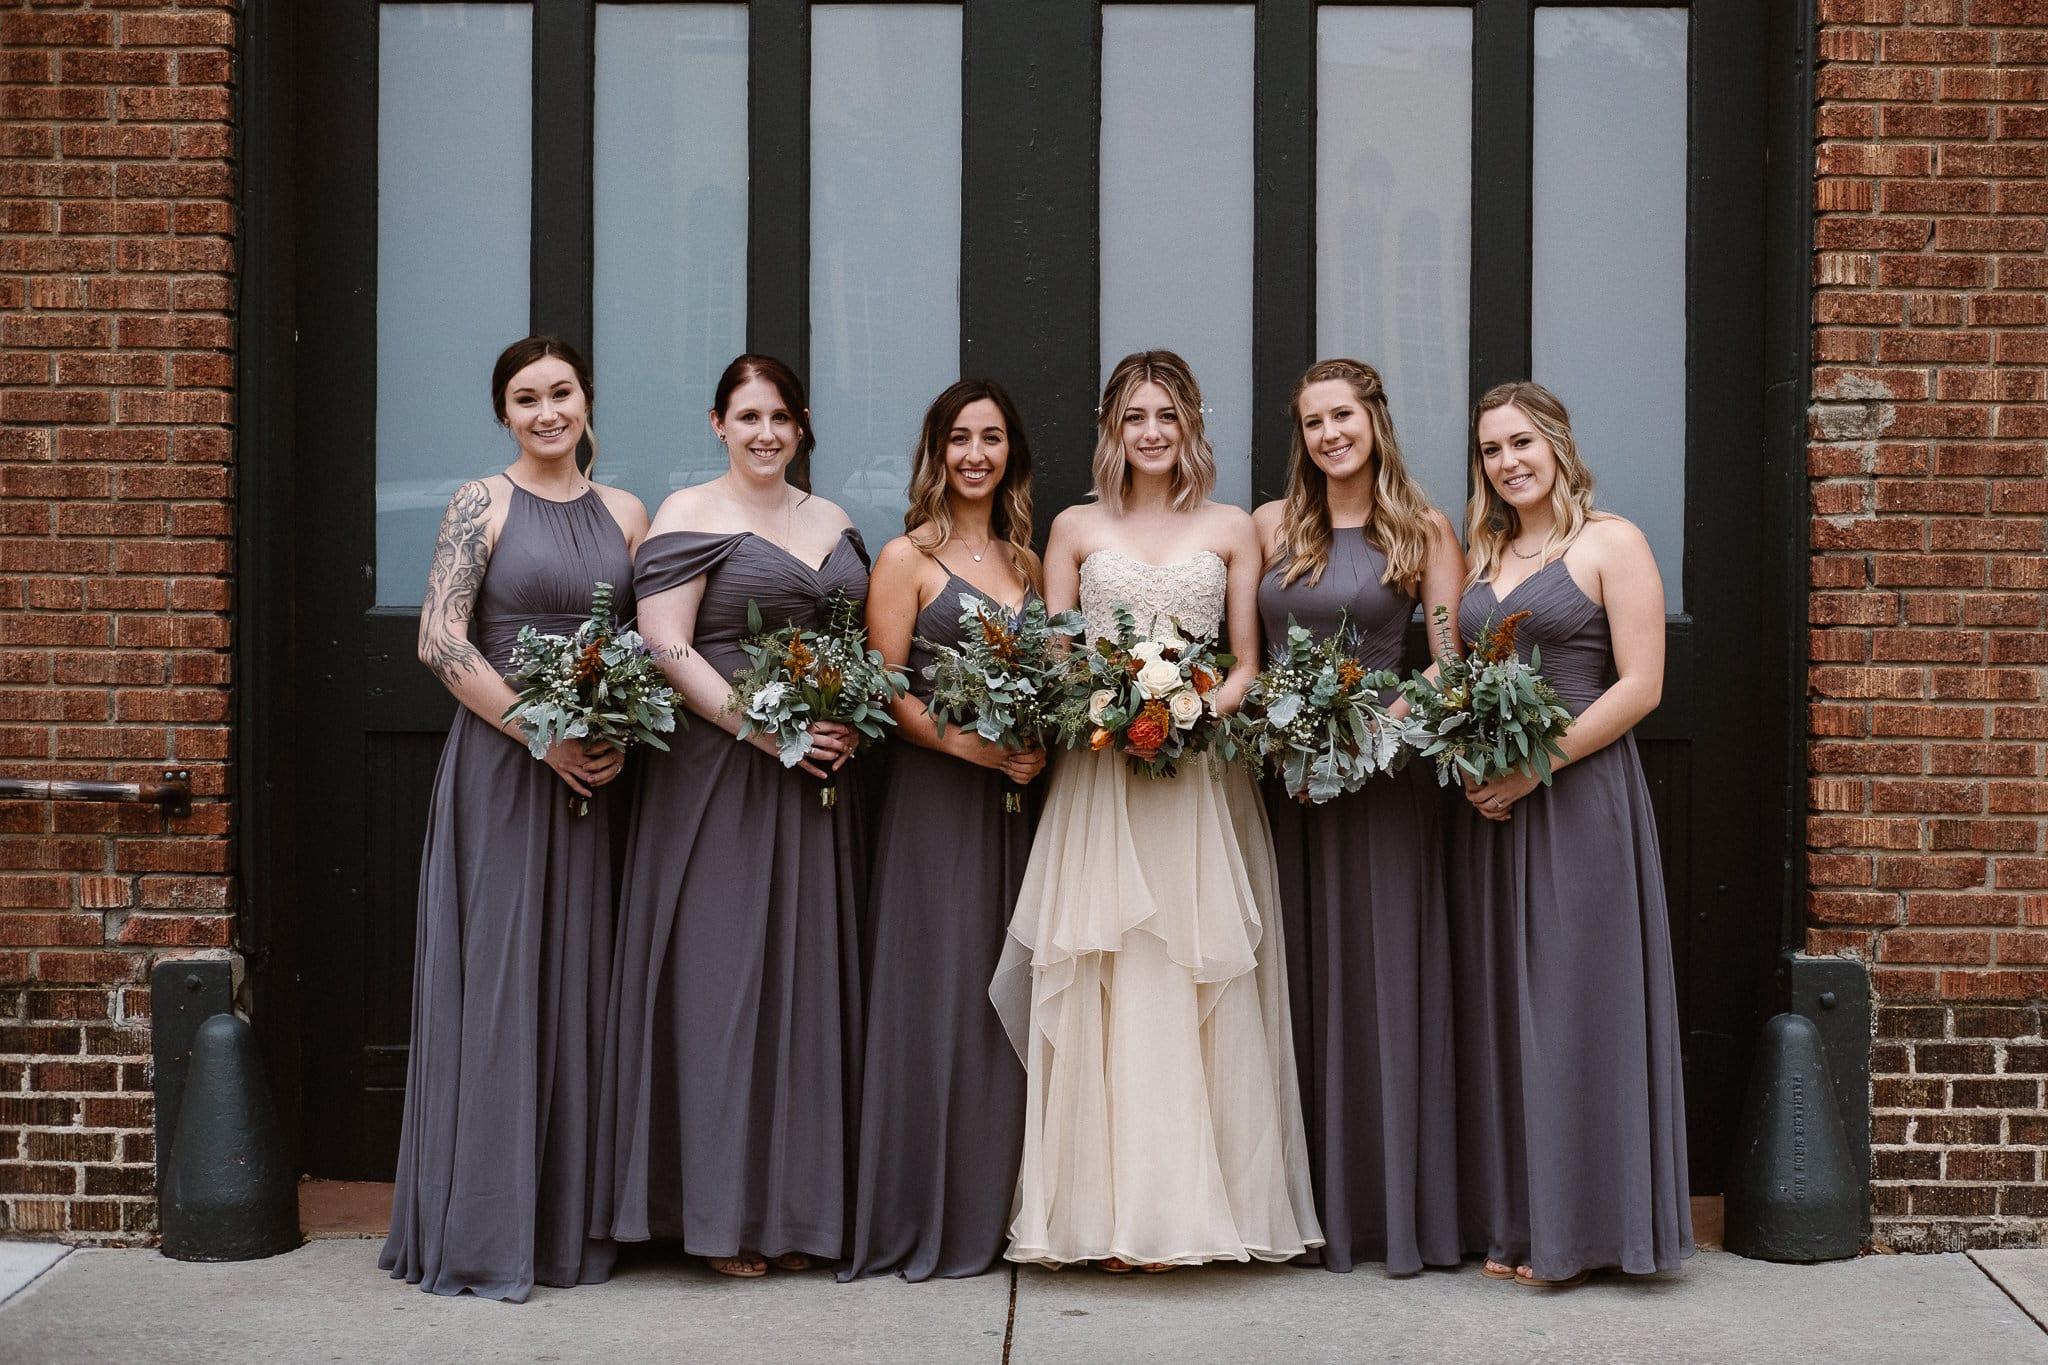 St Vrain Wedding Photographer   Longmont Wedding Photographer   Colorado Winter Wedding Photographer, Colorado industrial chic wedding, bride with bridesmaids, Marchesa wedding dress, gray bridesmaid dresses